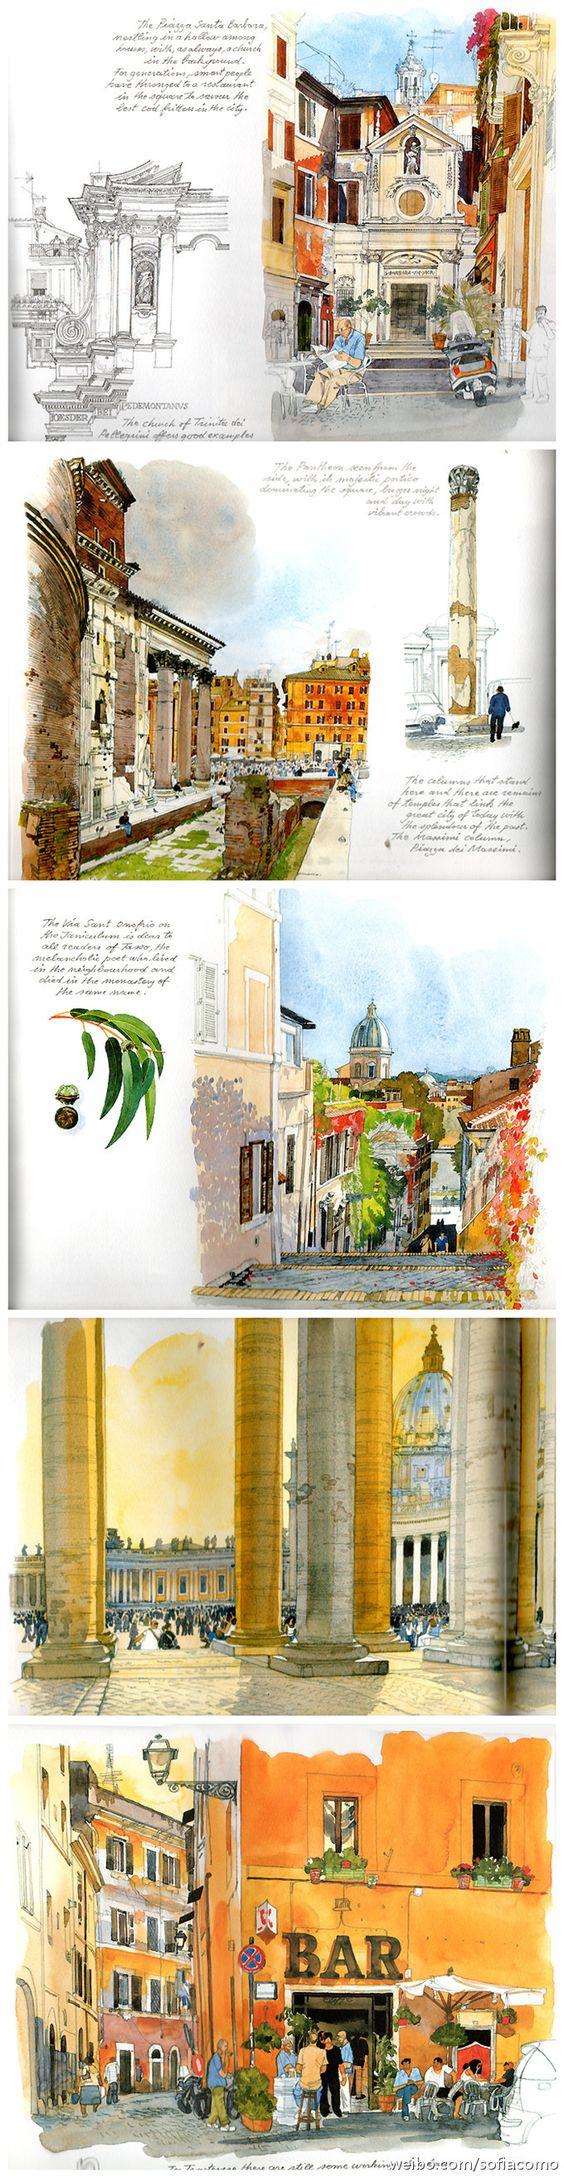 Gypsy Living Traveling In Style | Serafini Amelia| Wanderlust-Gypsy Travel Journal http://cdn.duitang.com/uploads/item/201204/03/20120403144354_hs8rP.jpeg Travelers Journal